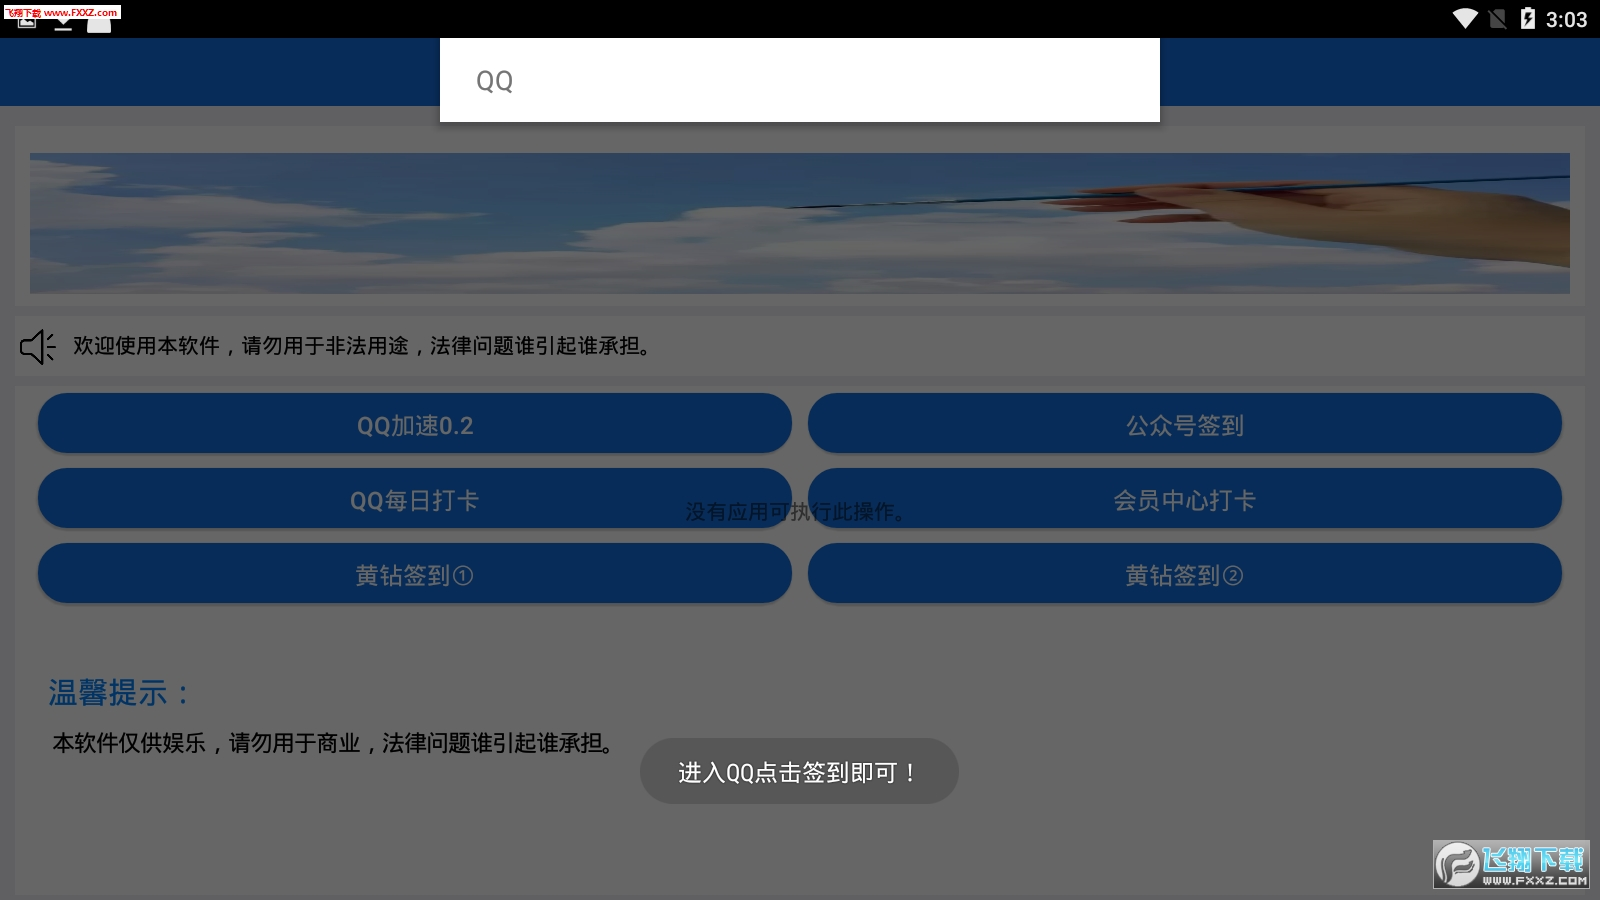 QQ加速王者免费appv2.0截图2